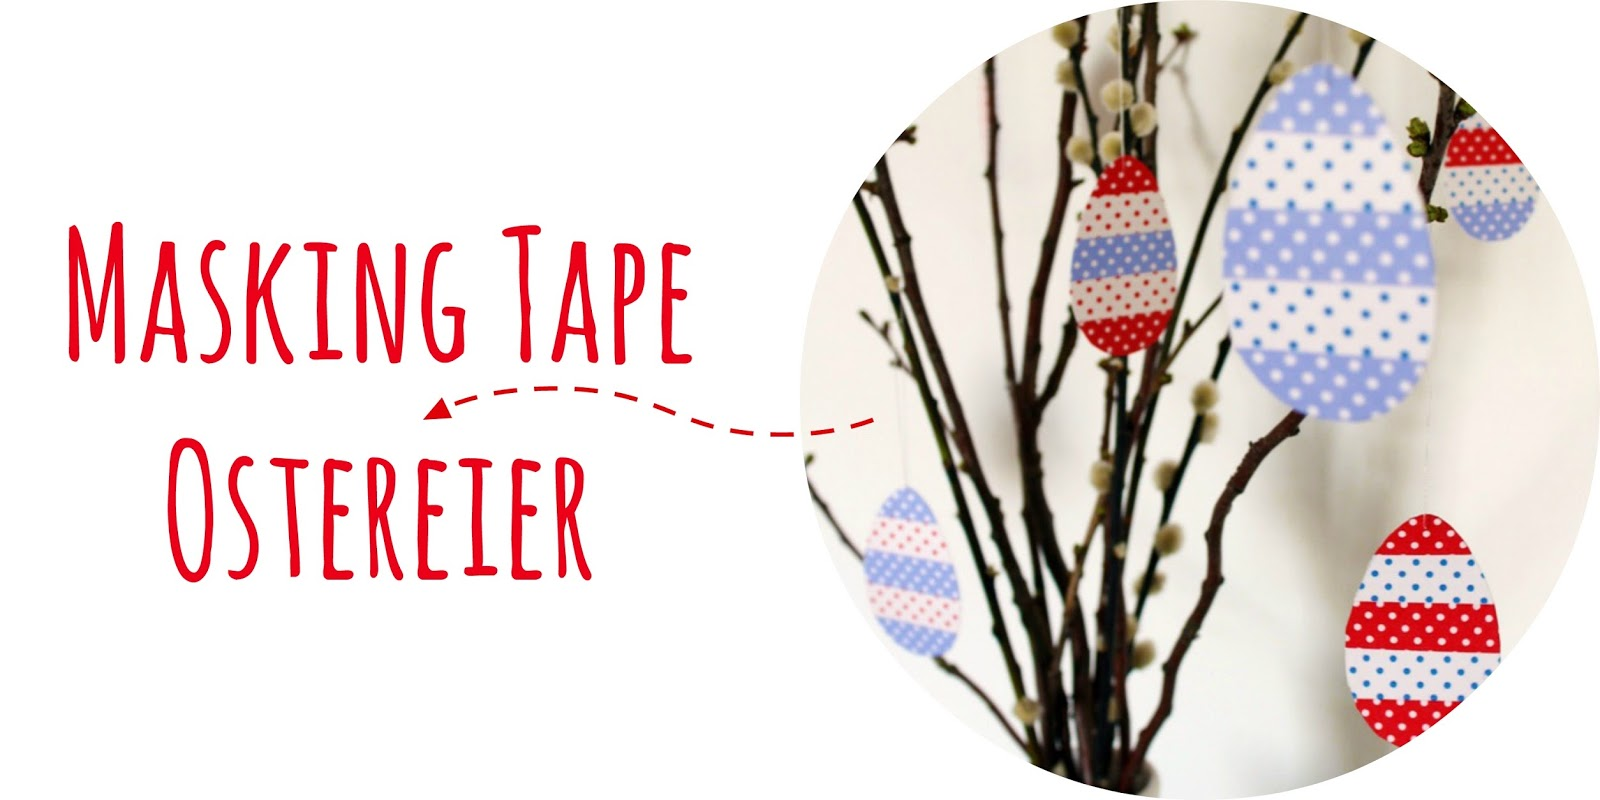 Ostern, Osterdeko, Oster DIY, Ostereier, Bastelideen zu Ostern, Osteridee, DIY, selbstgemacht, Masking Tape, Washi Tape